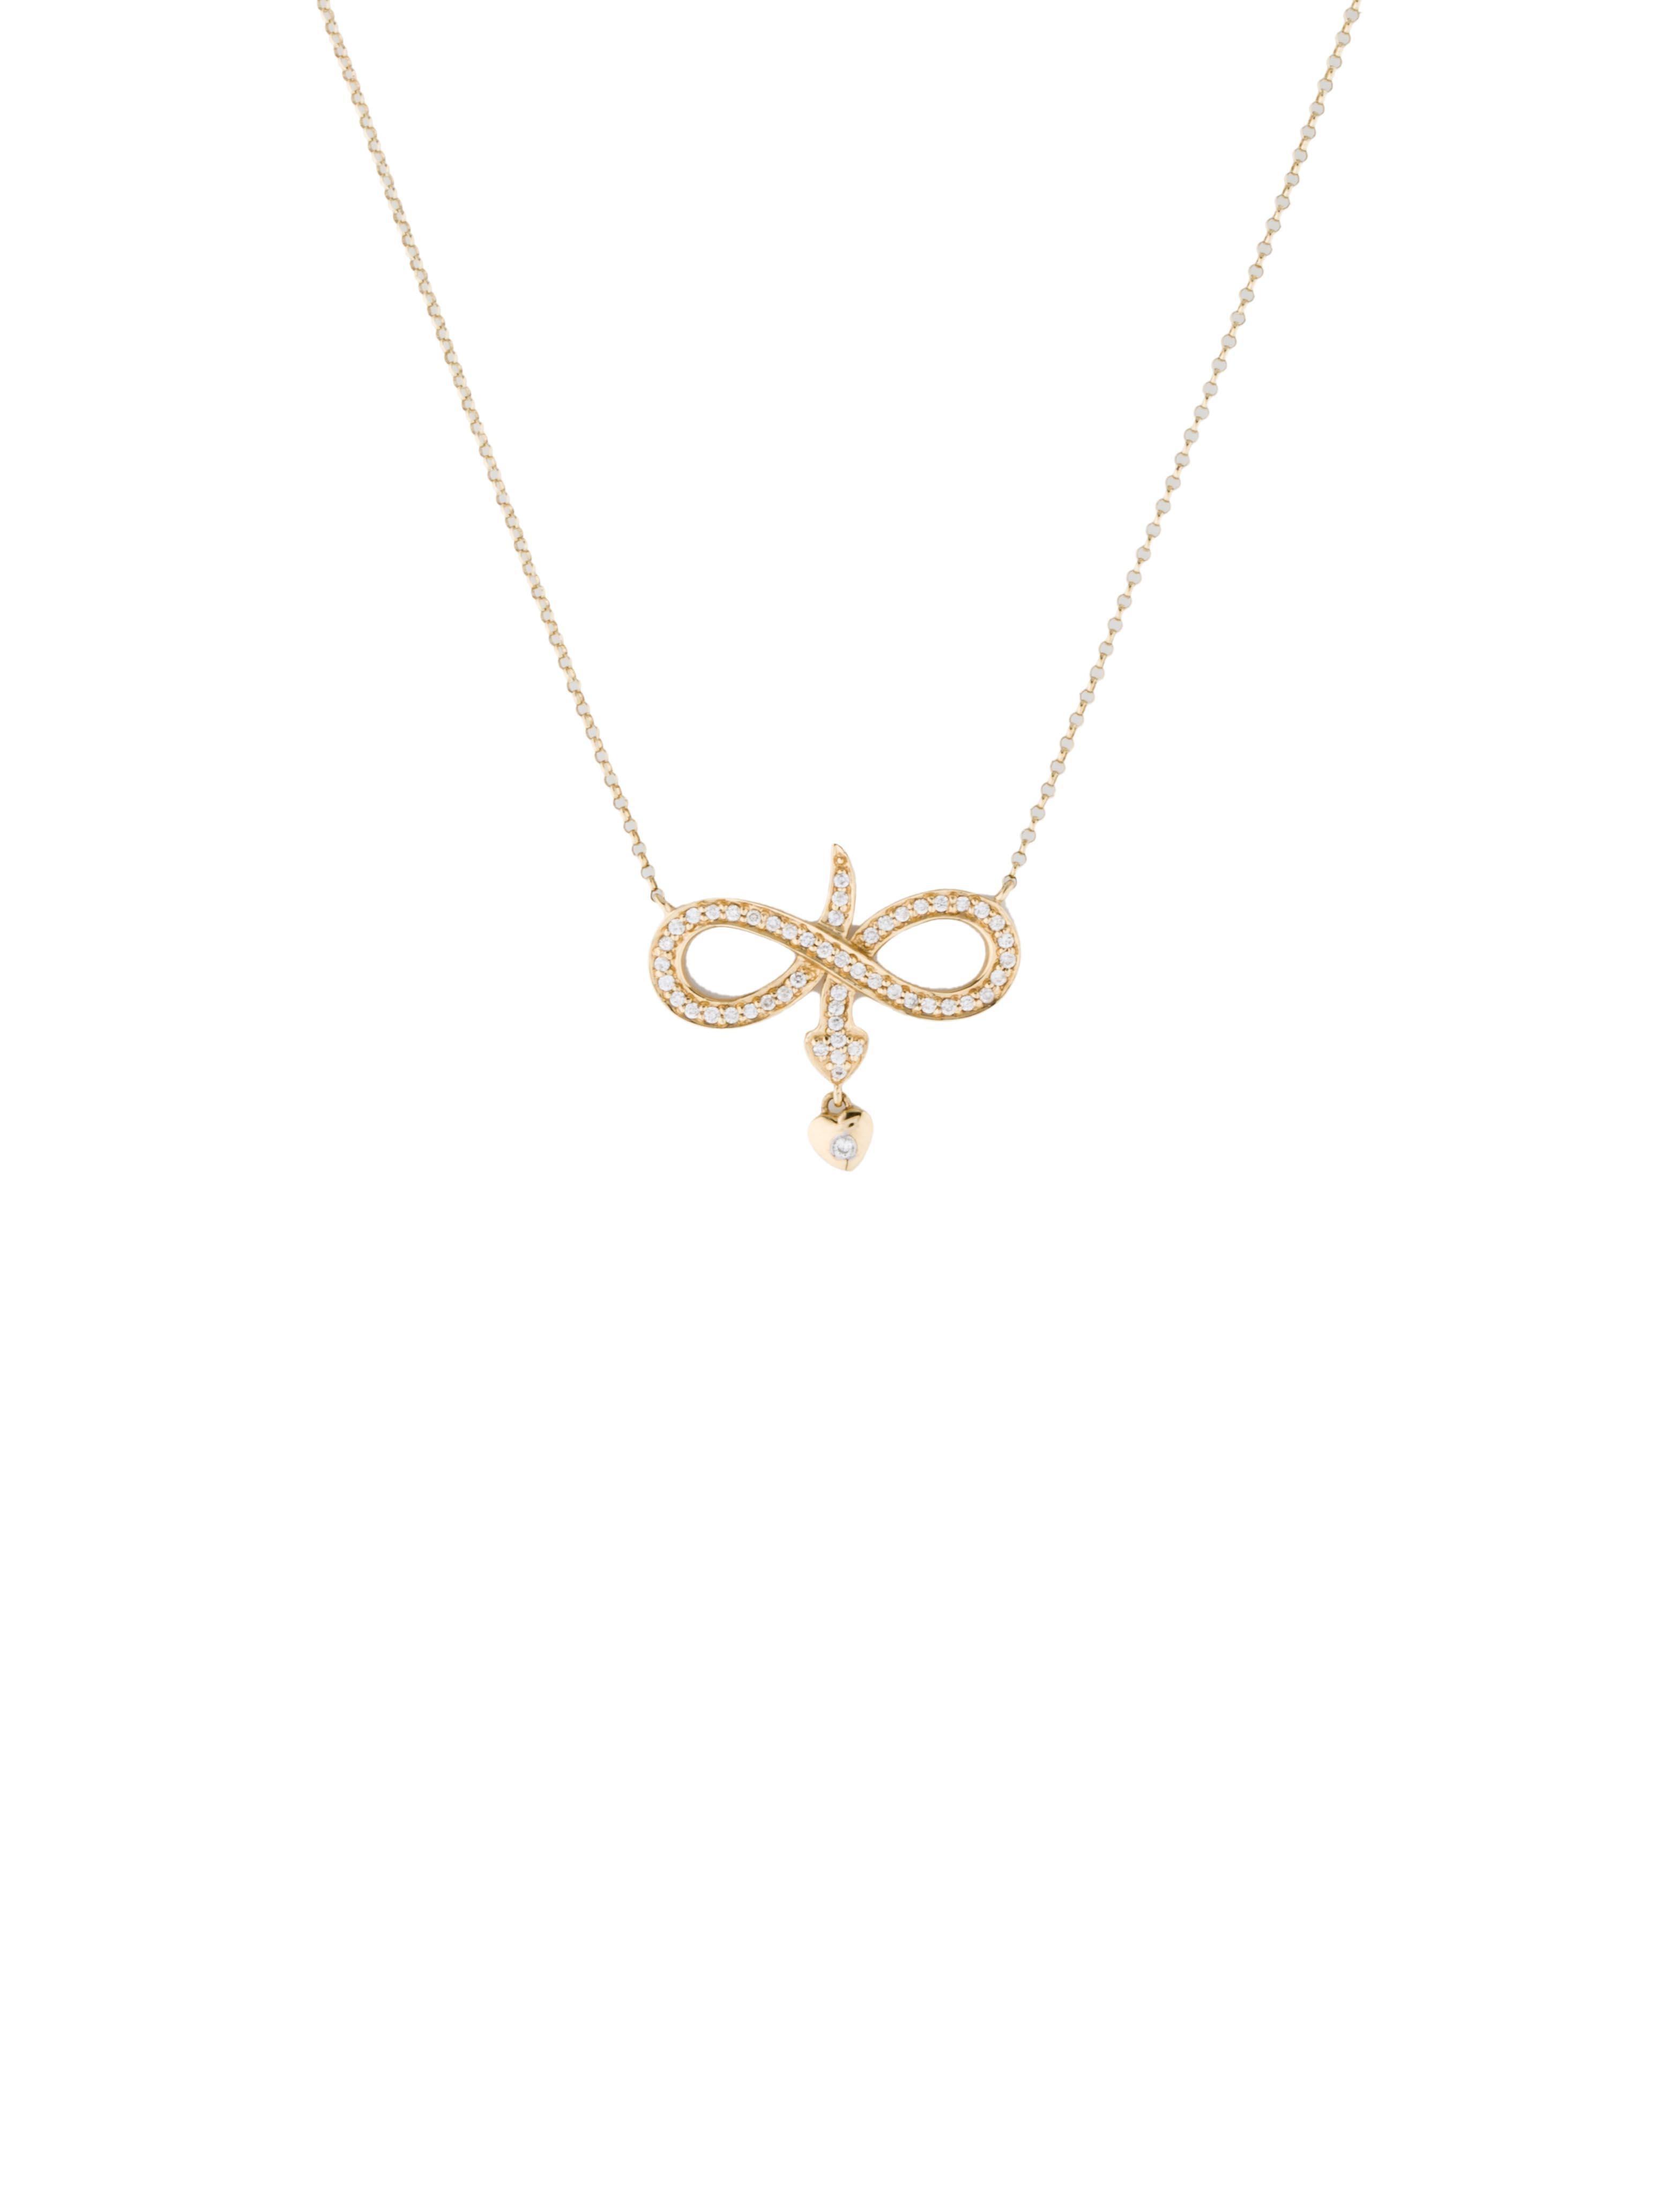 Diamond Infinity Symbol Necklace Necklaces Fjn23443 The Realreal